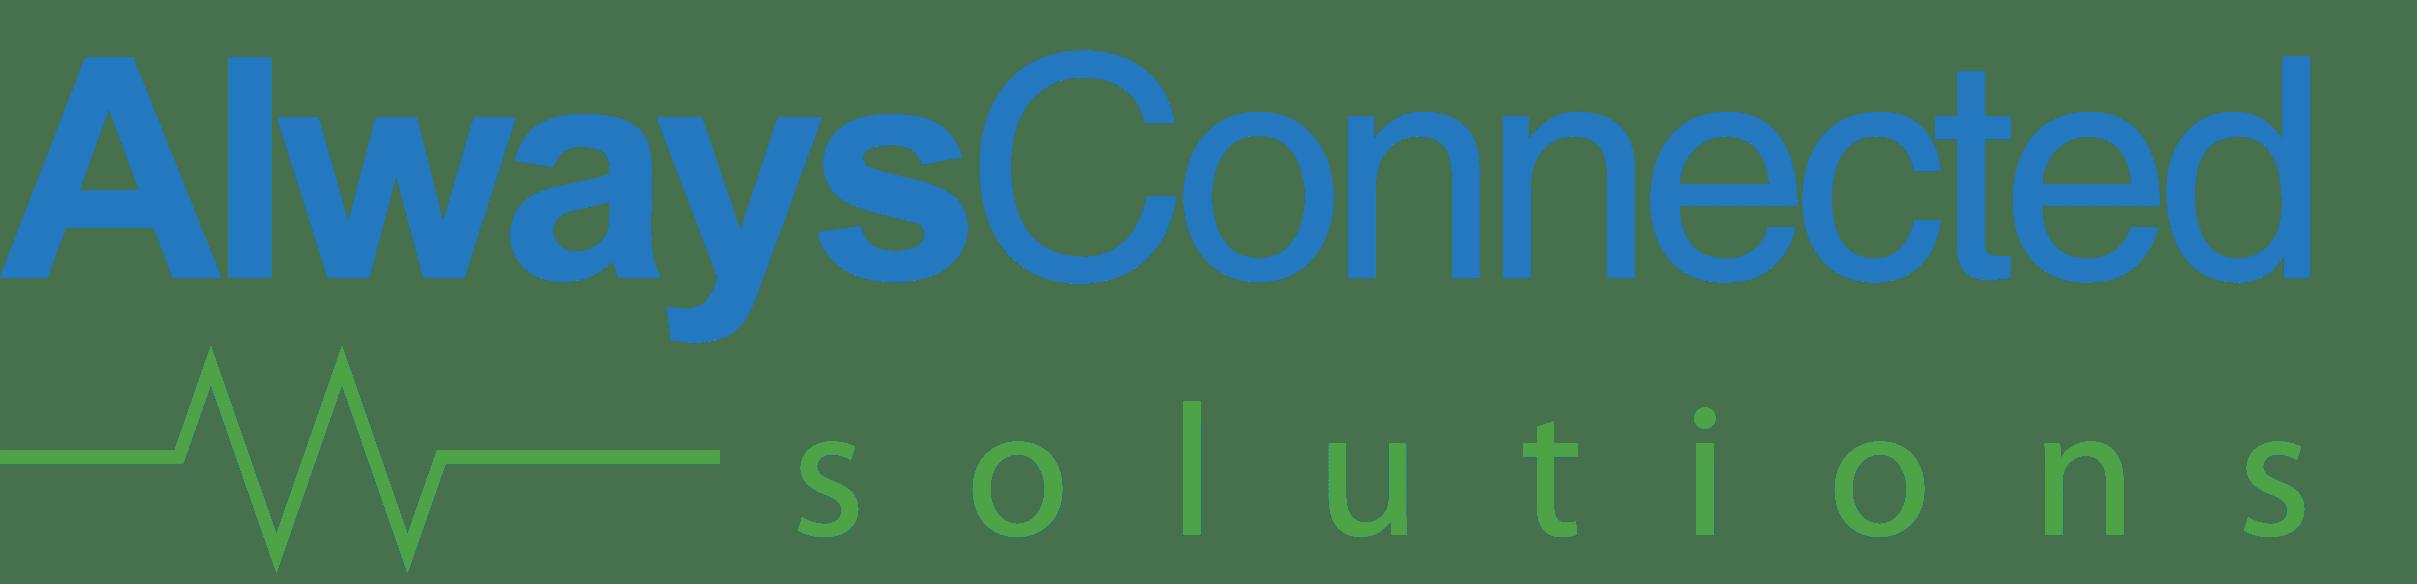 2021-ACS_Logo-Editable-trans